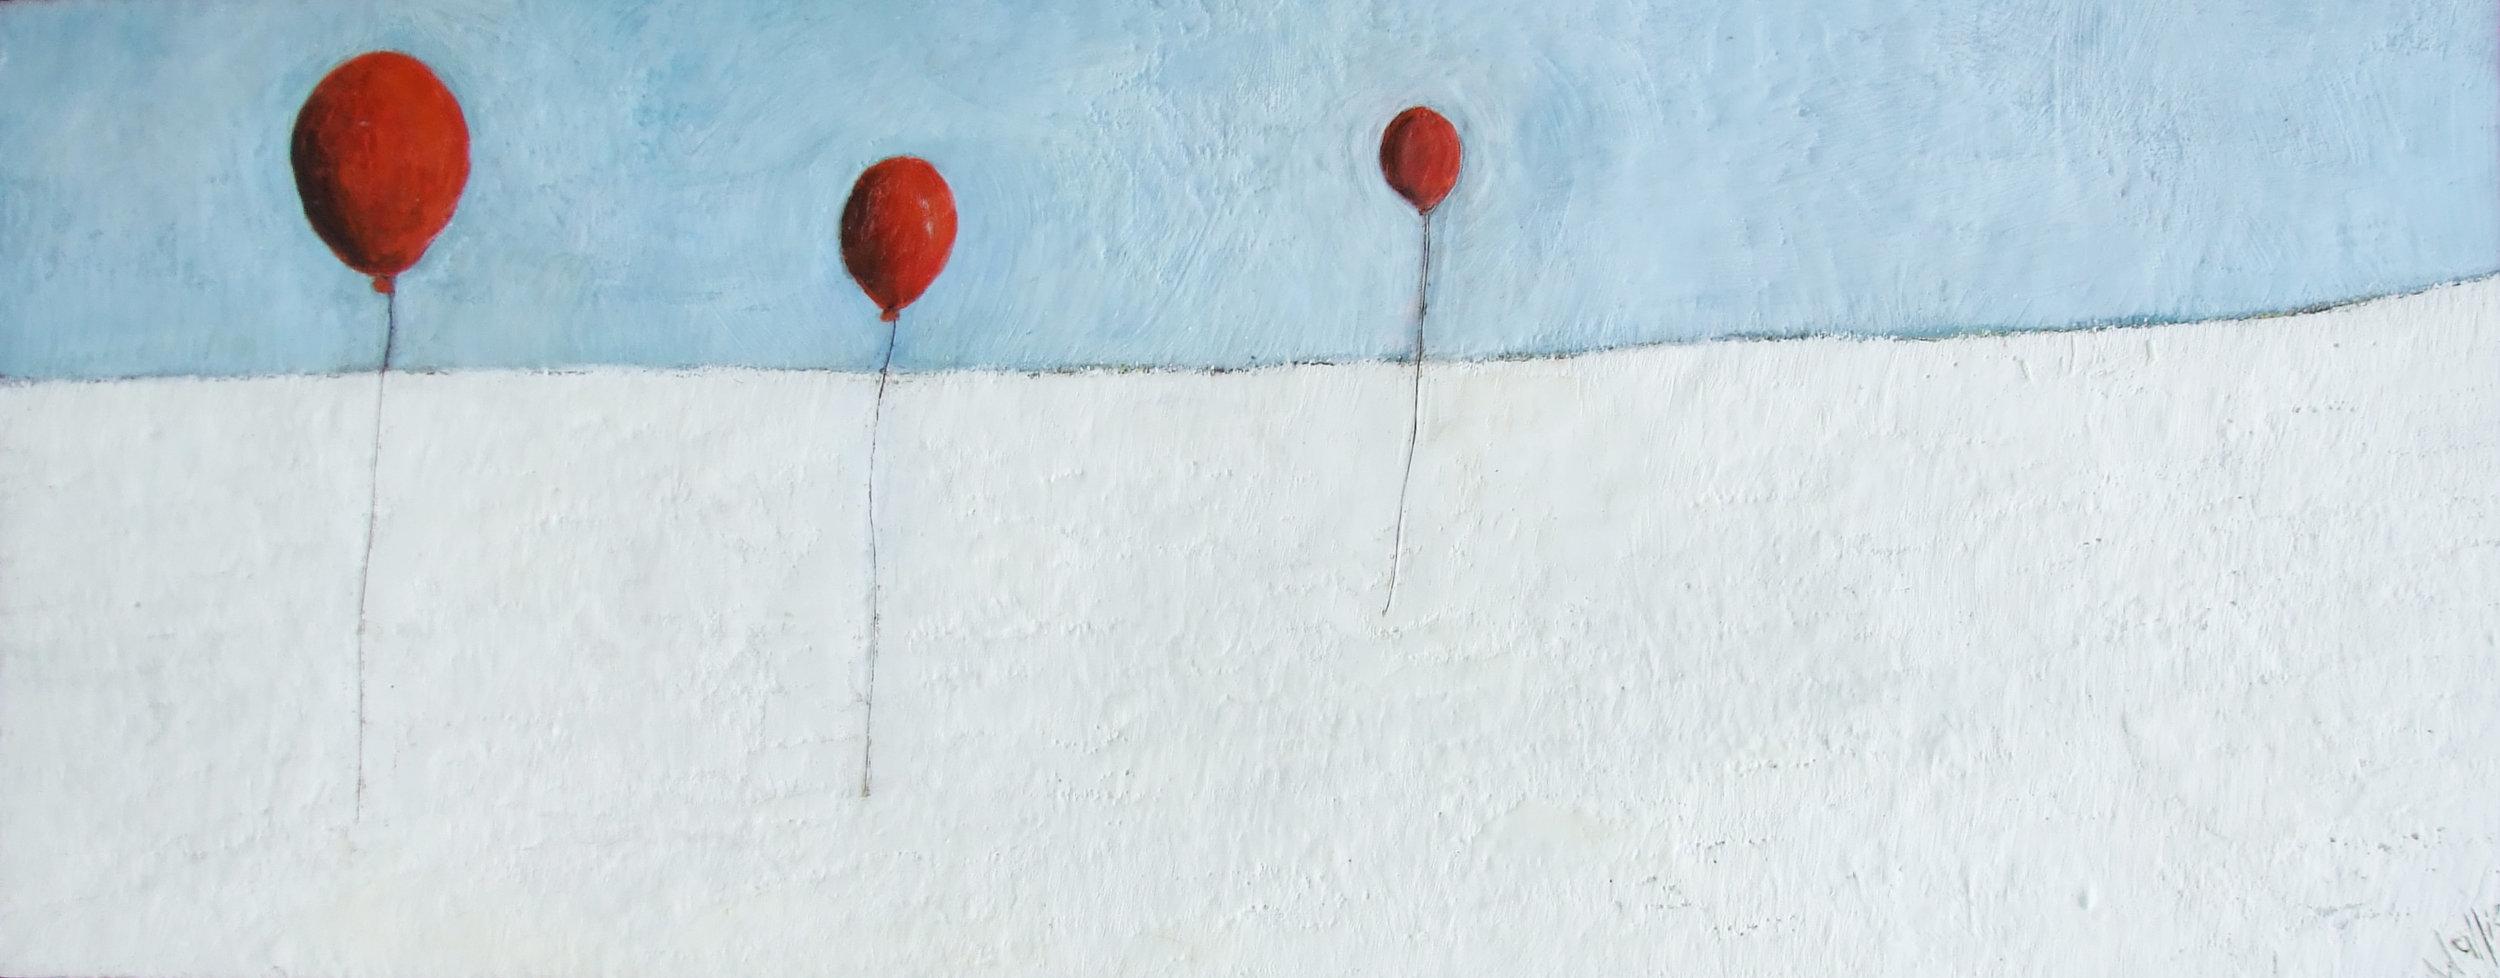 Floating Apart 60x24 encaustic wax art by susan wallis